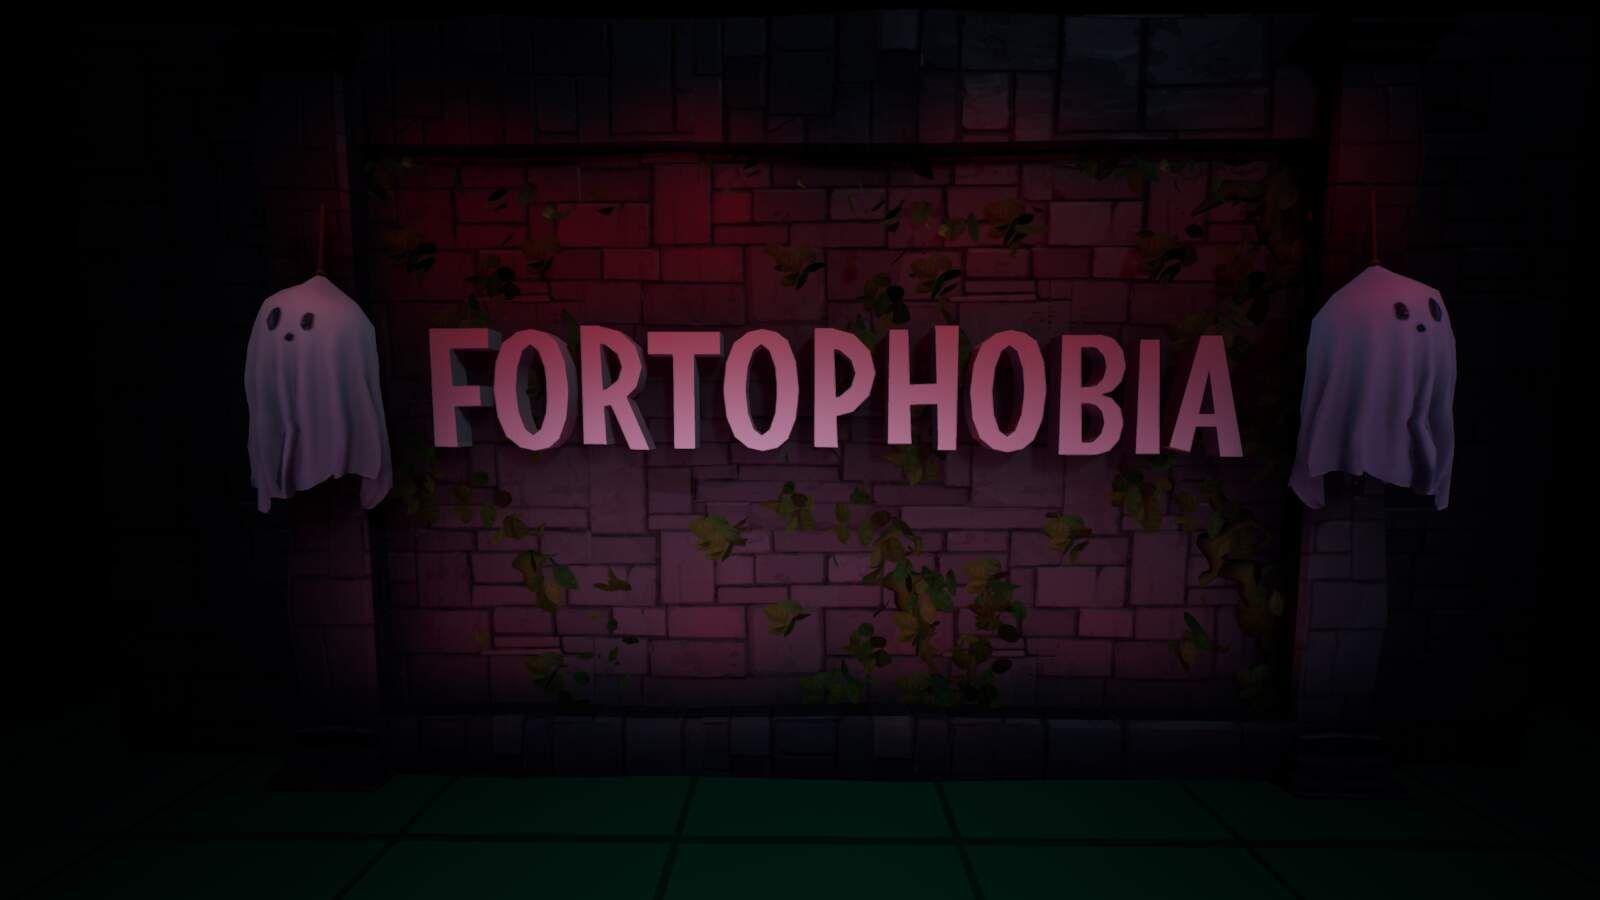 Fortophobia 2108-2091-0547 by TeamUnite